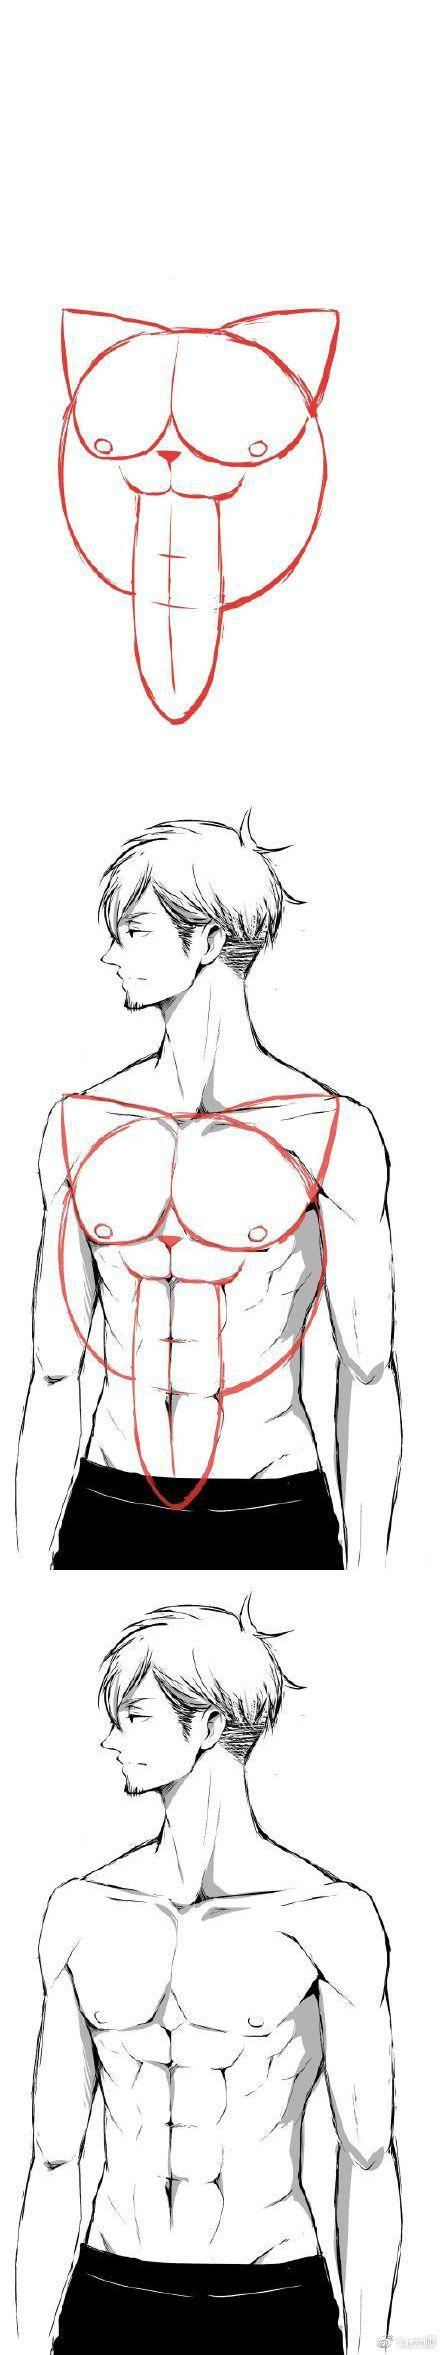 0065lVW0ly1fdrehd28e6j30c81tf12c.jpg (440×2355)   how to draw anime ...